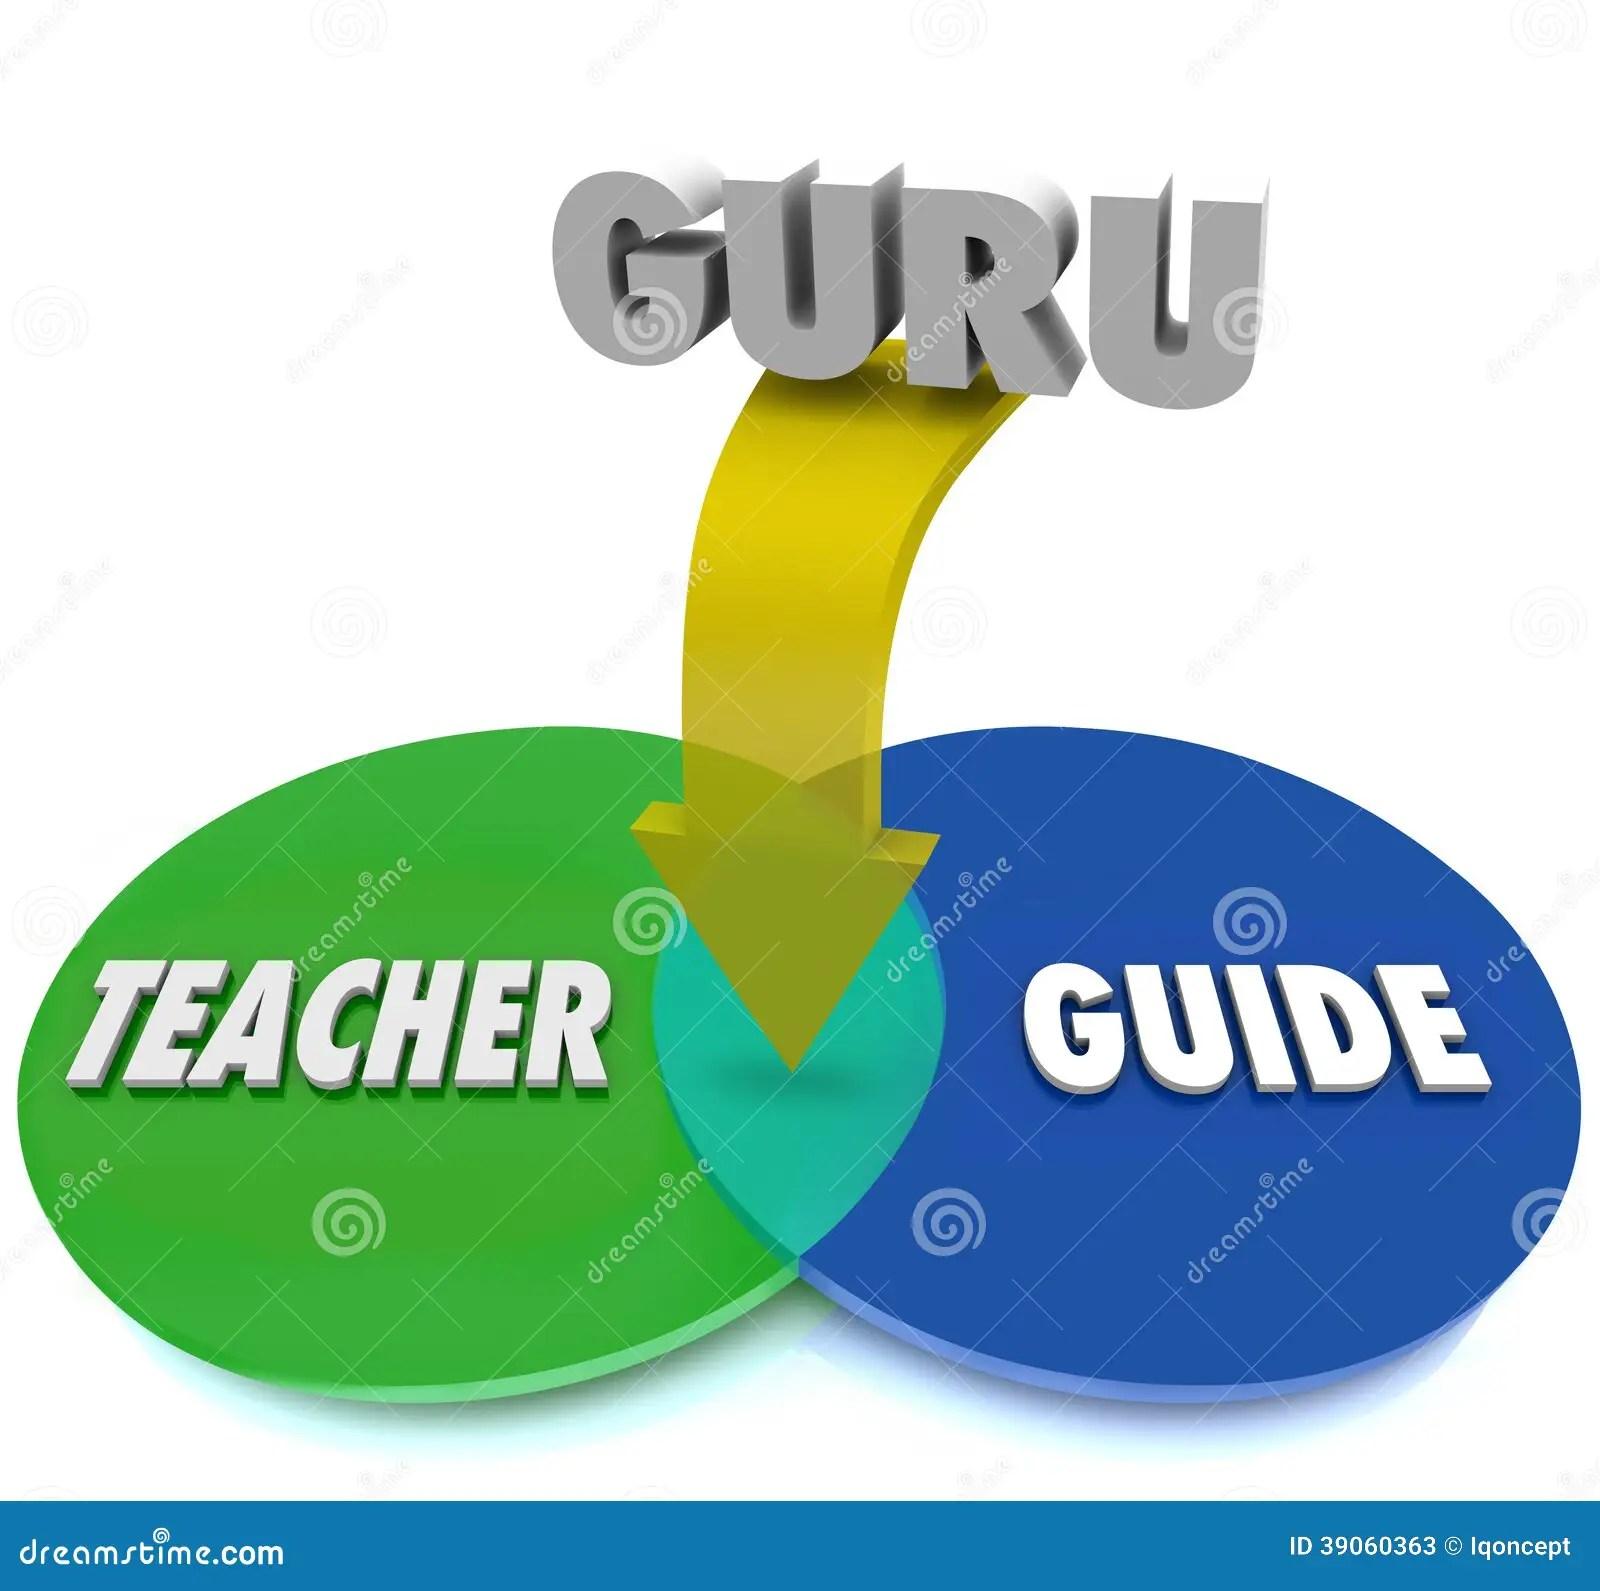 hight resolution of guru venn diagram teacher guide expert master